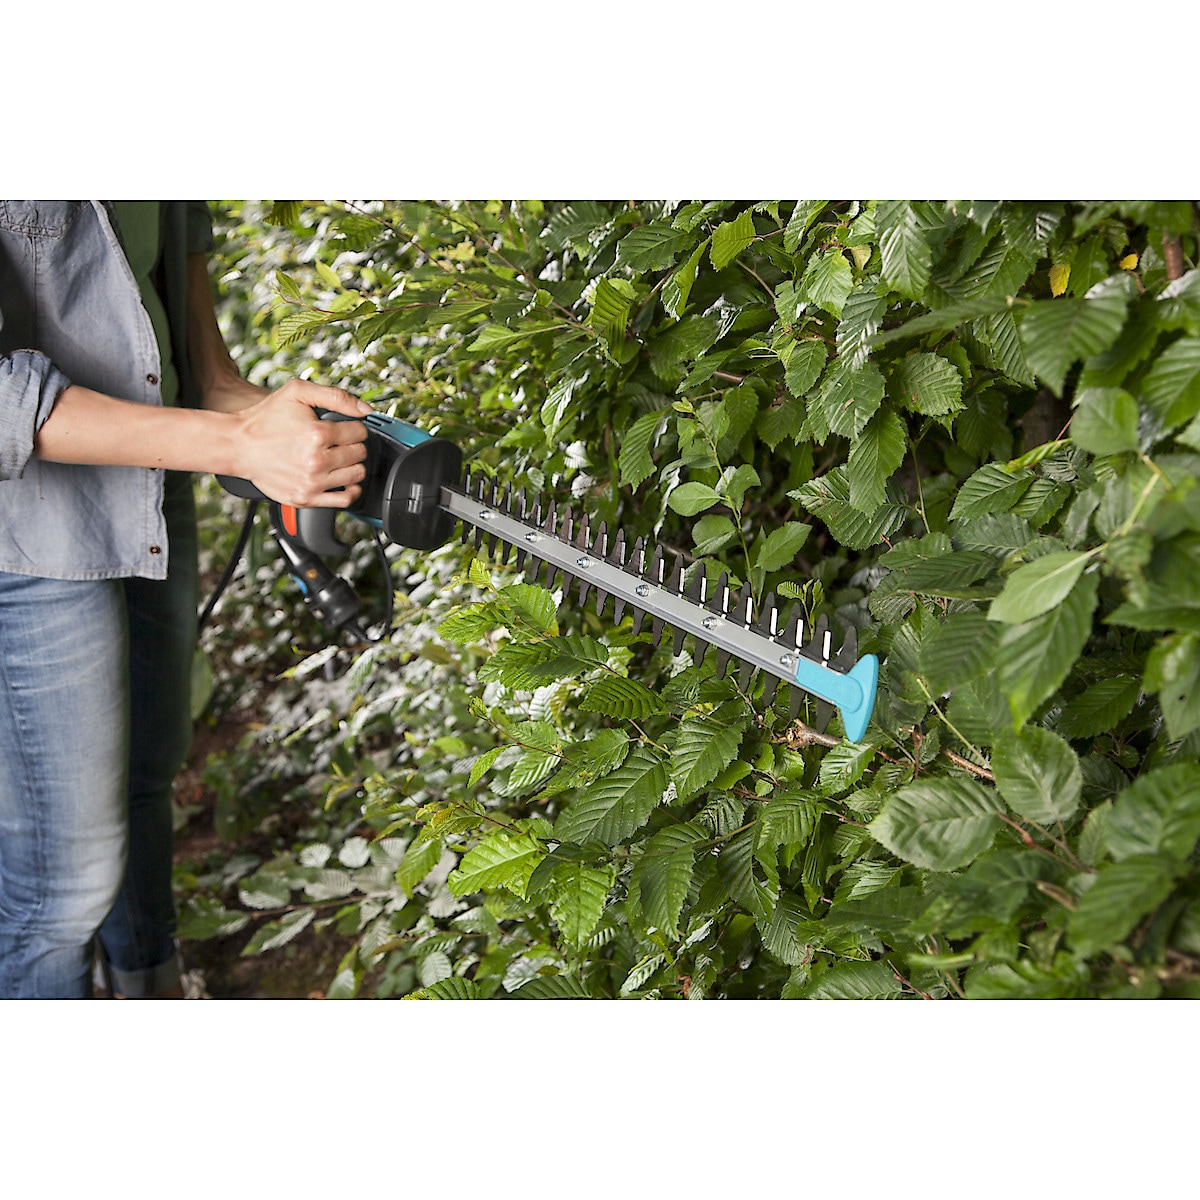 Gardena Easycut 420/45, hekksaks